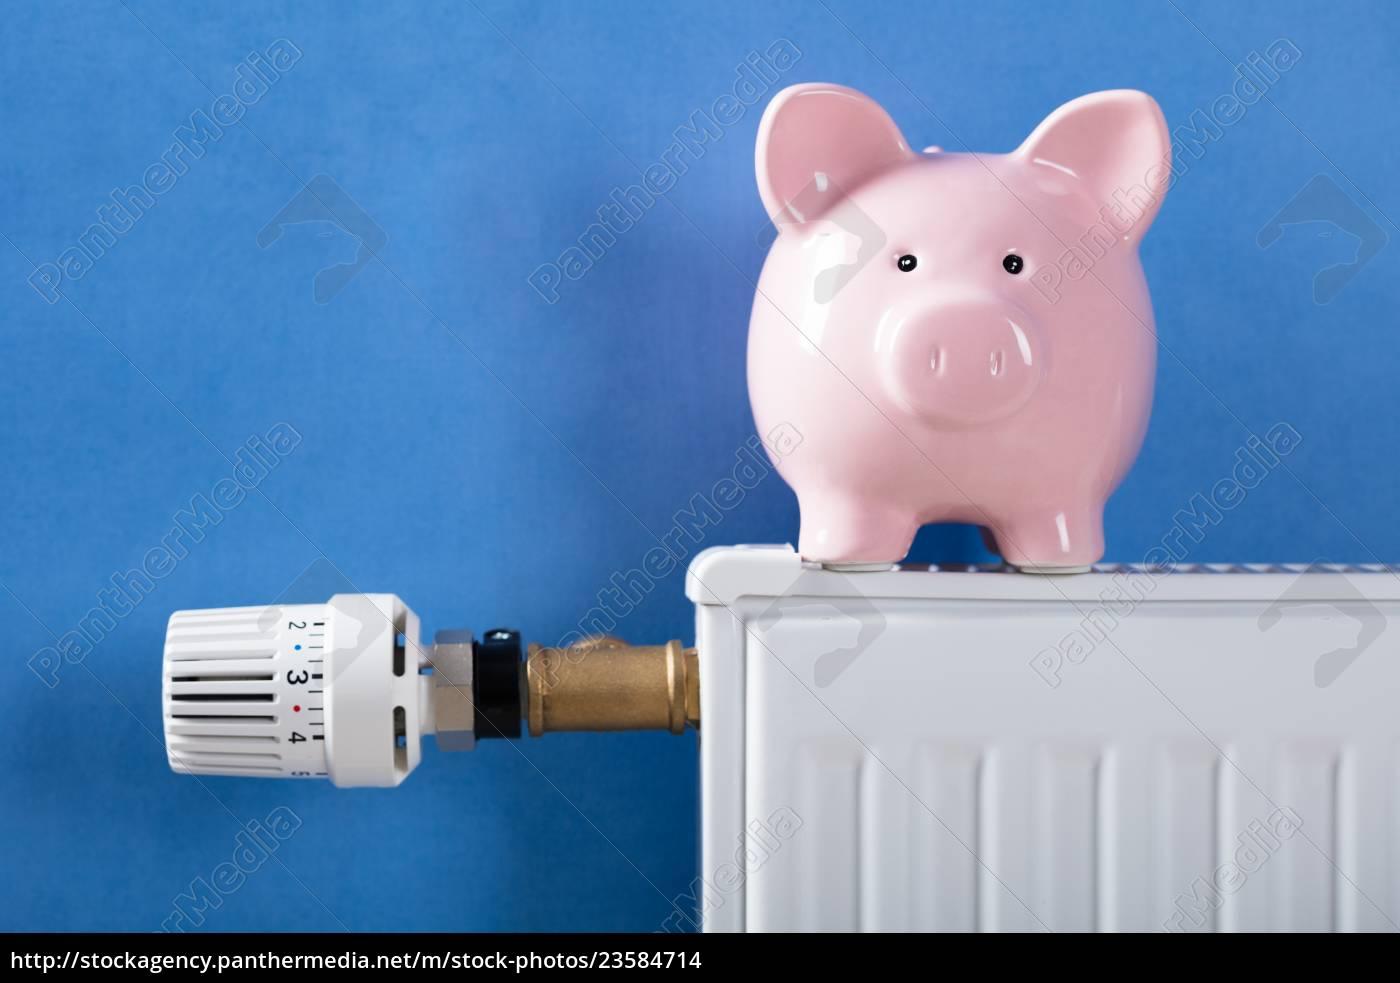 piggy, bank, on, heating, radiator - 23584714